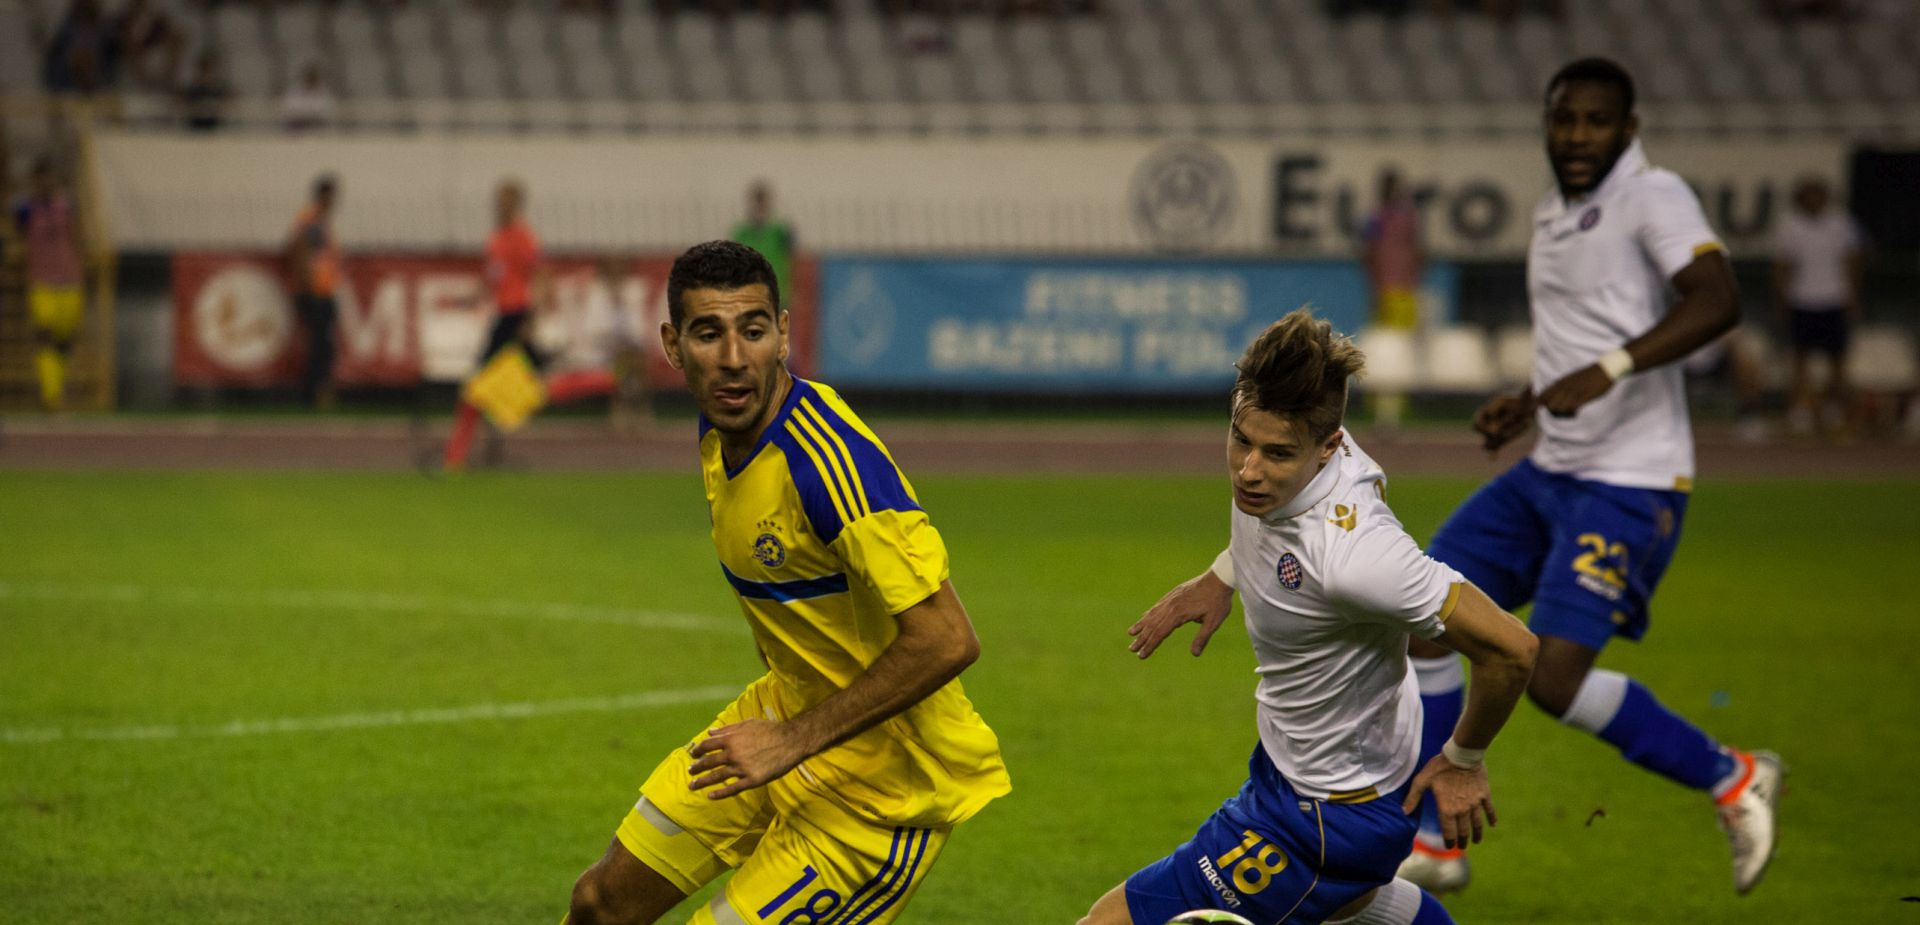 NAKON JEDANESTERACA: Hajduk ostao bez Europske lige